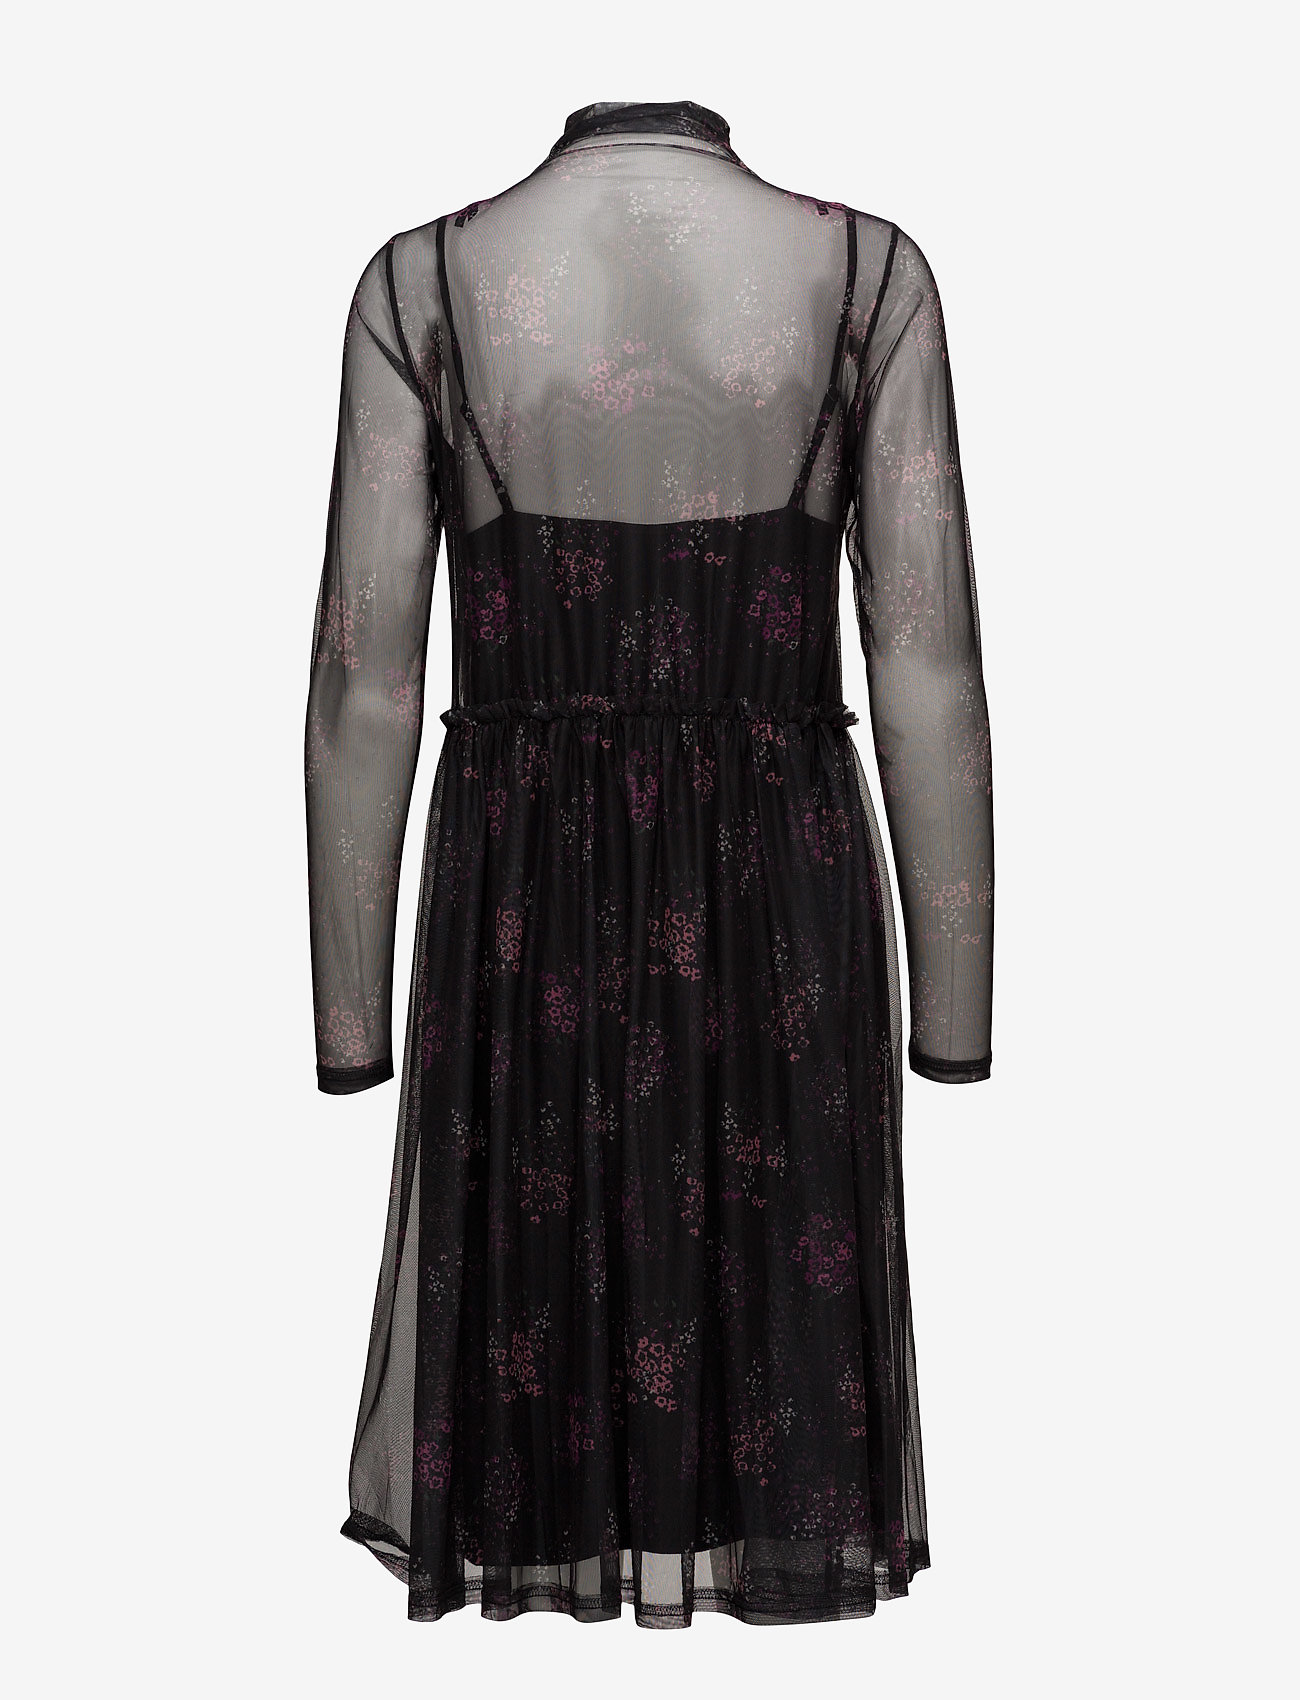 Mesha Dress Ze1 17 (Pink/black Print) (599.50 kr) - Gestuz